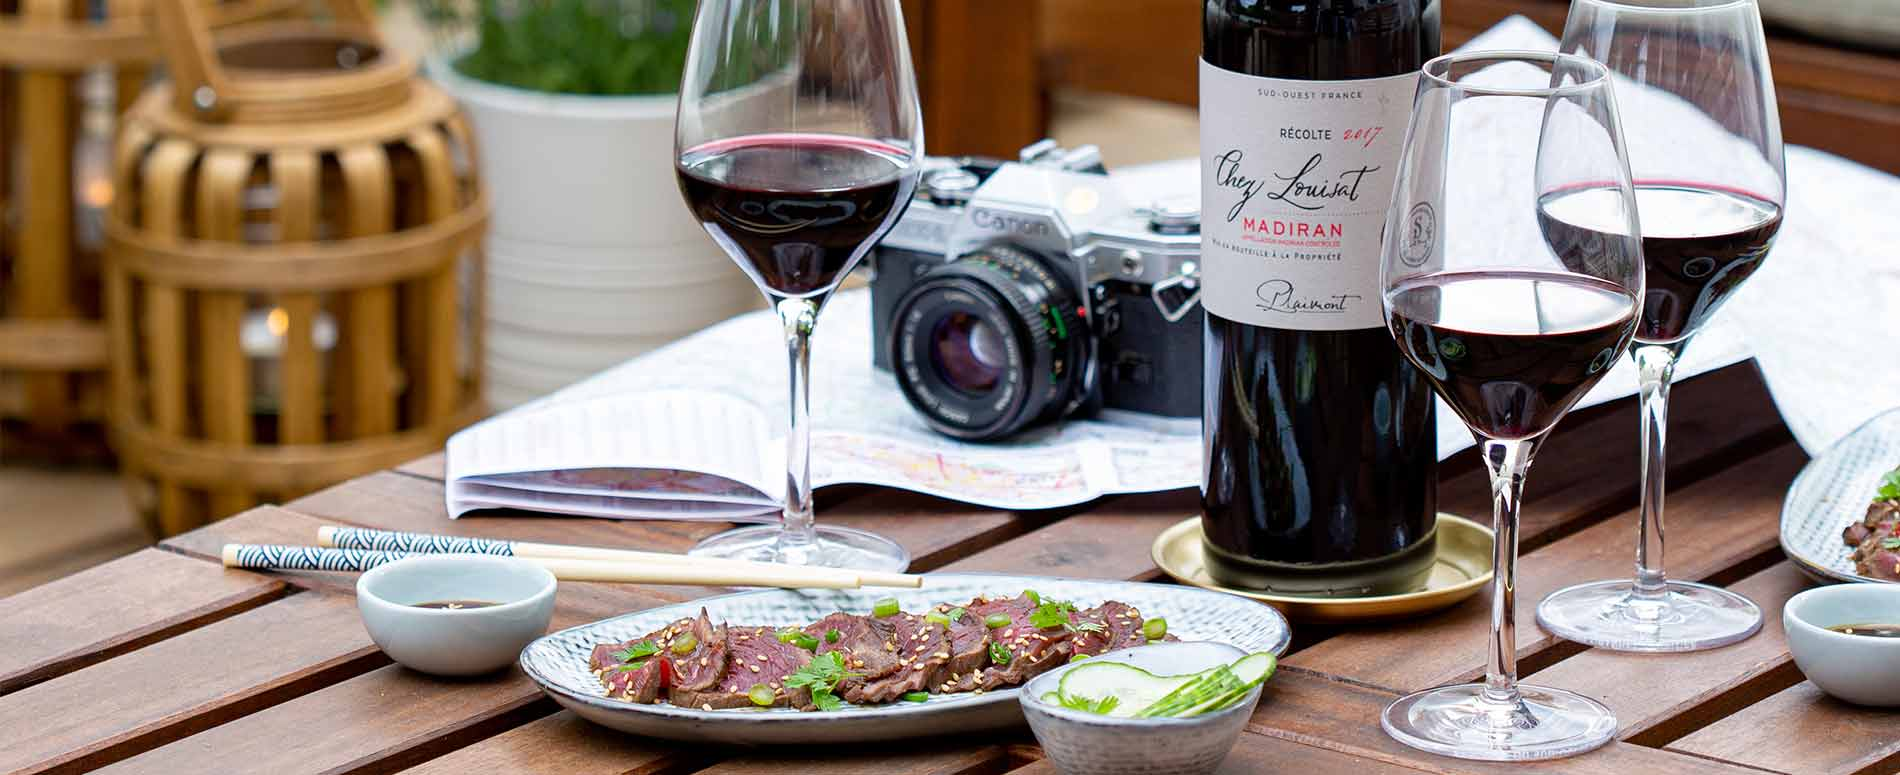 Recette tataki de boeuf - Accords mets et vin